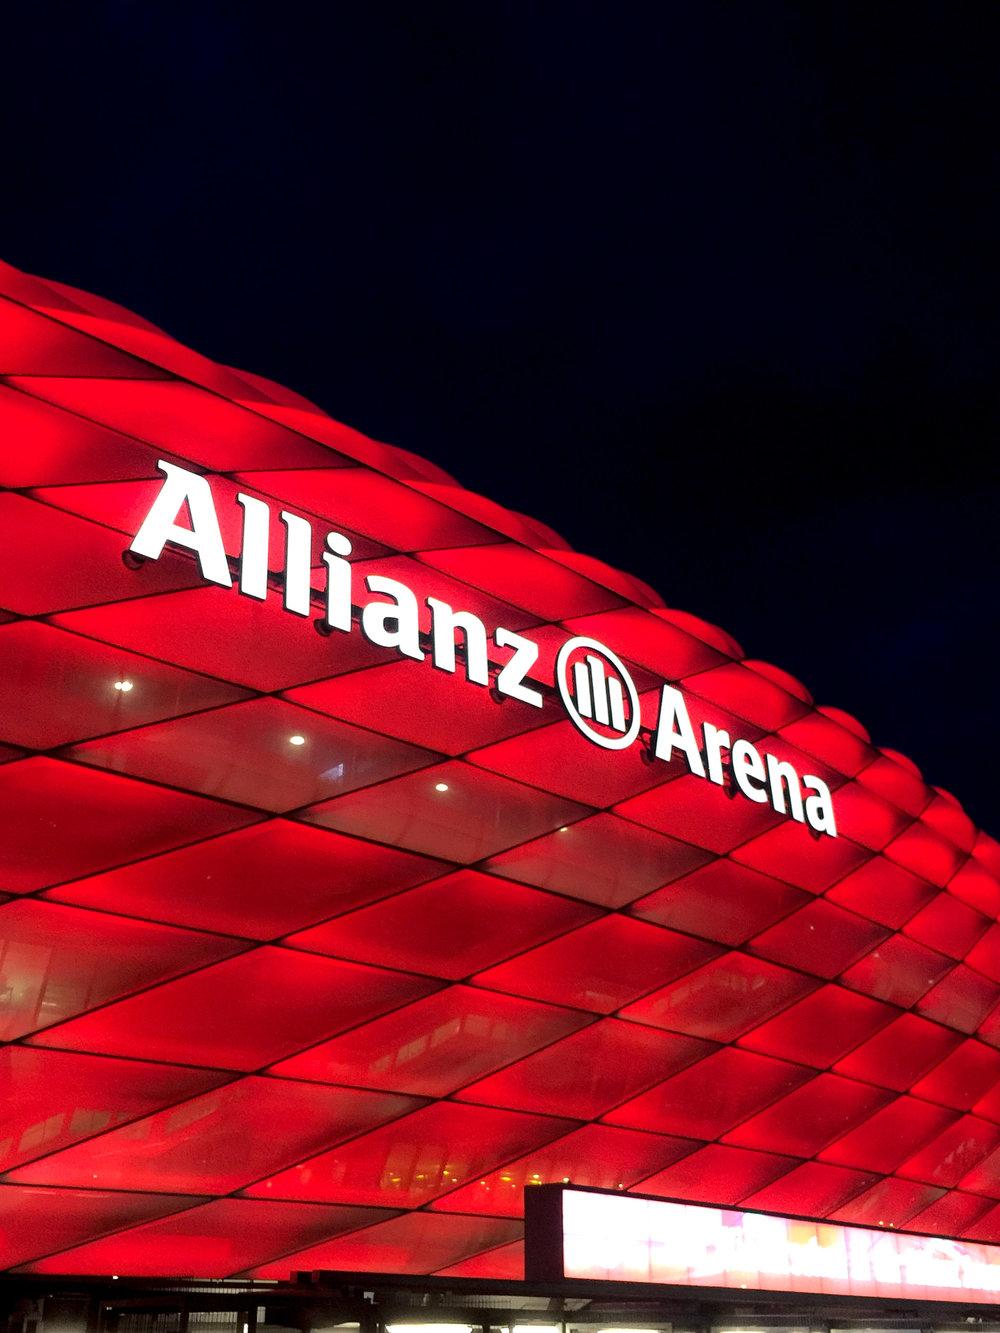 Munich Allianz 4